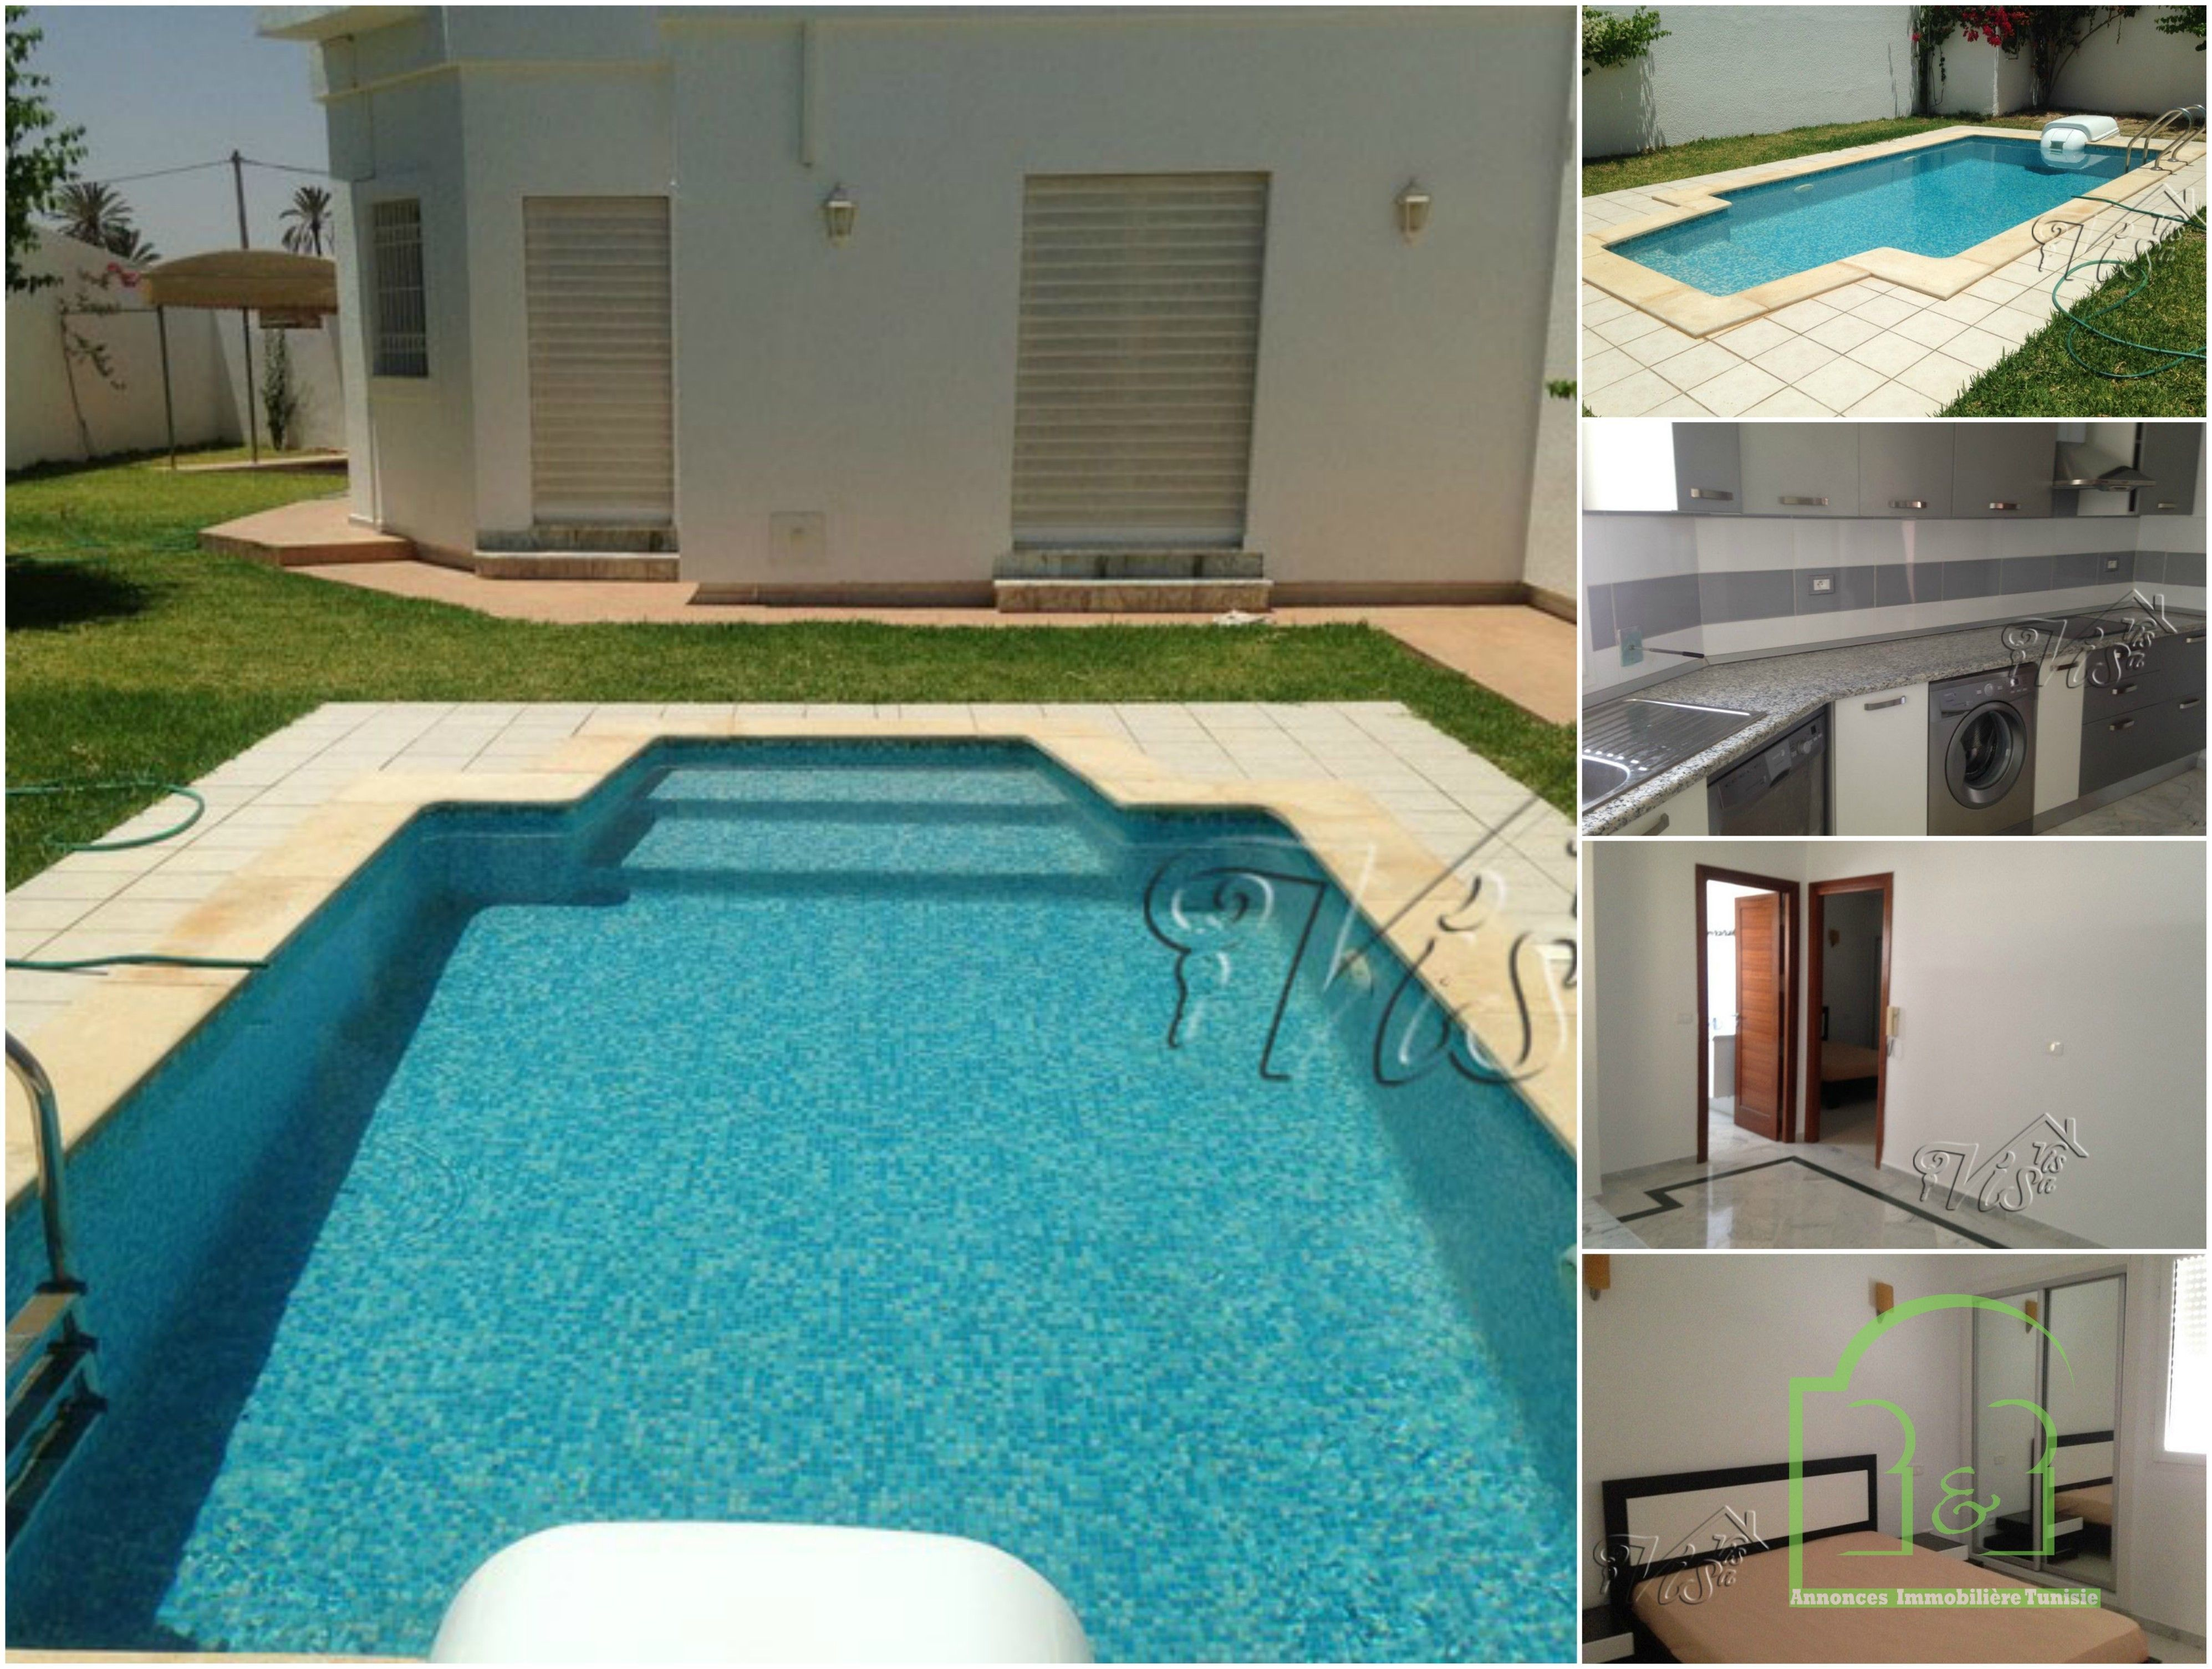 À Vendre à Djerba Vente Villa Neuve SituÉe A Midoun Djerba Bnb Tunisie Outdoor Decor Home Home Decor